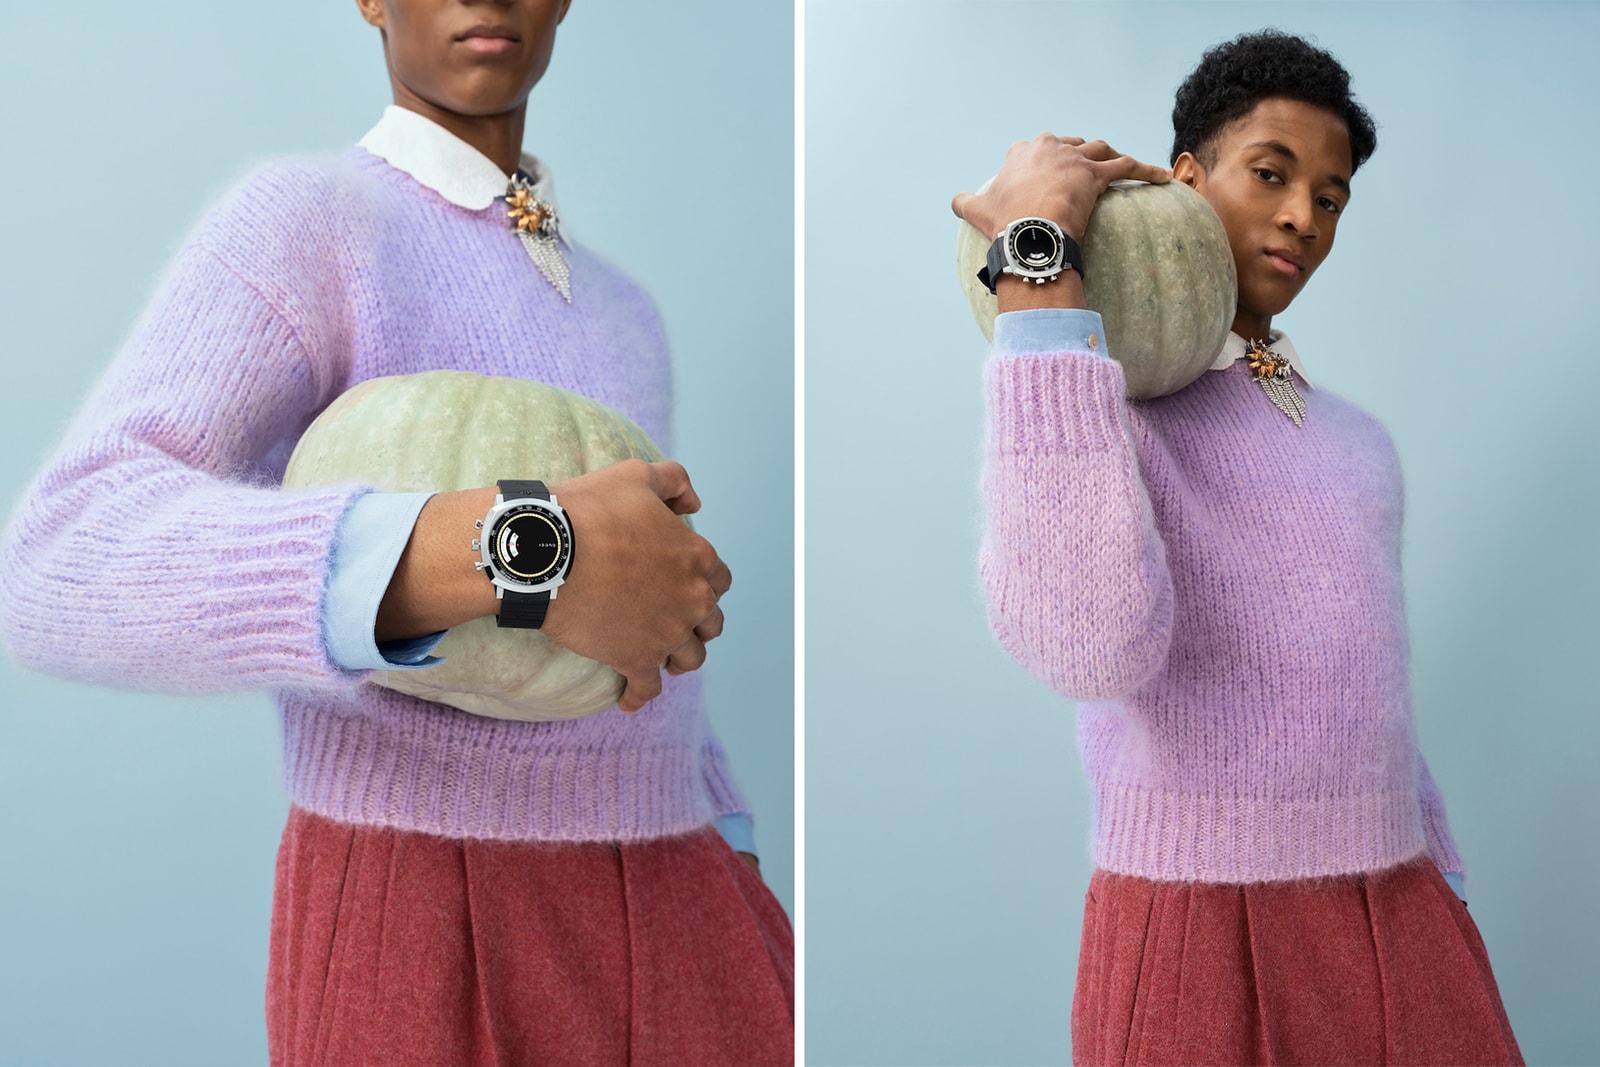 gucci grip watch chronograph function steel case accessories lookbook shoot skateboard